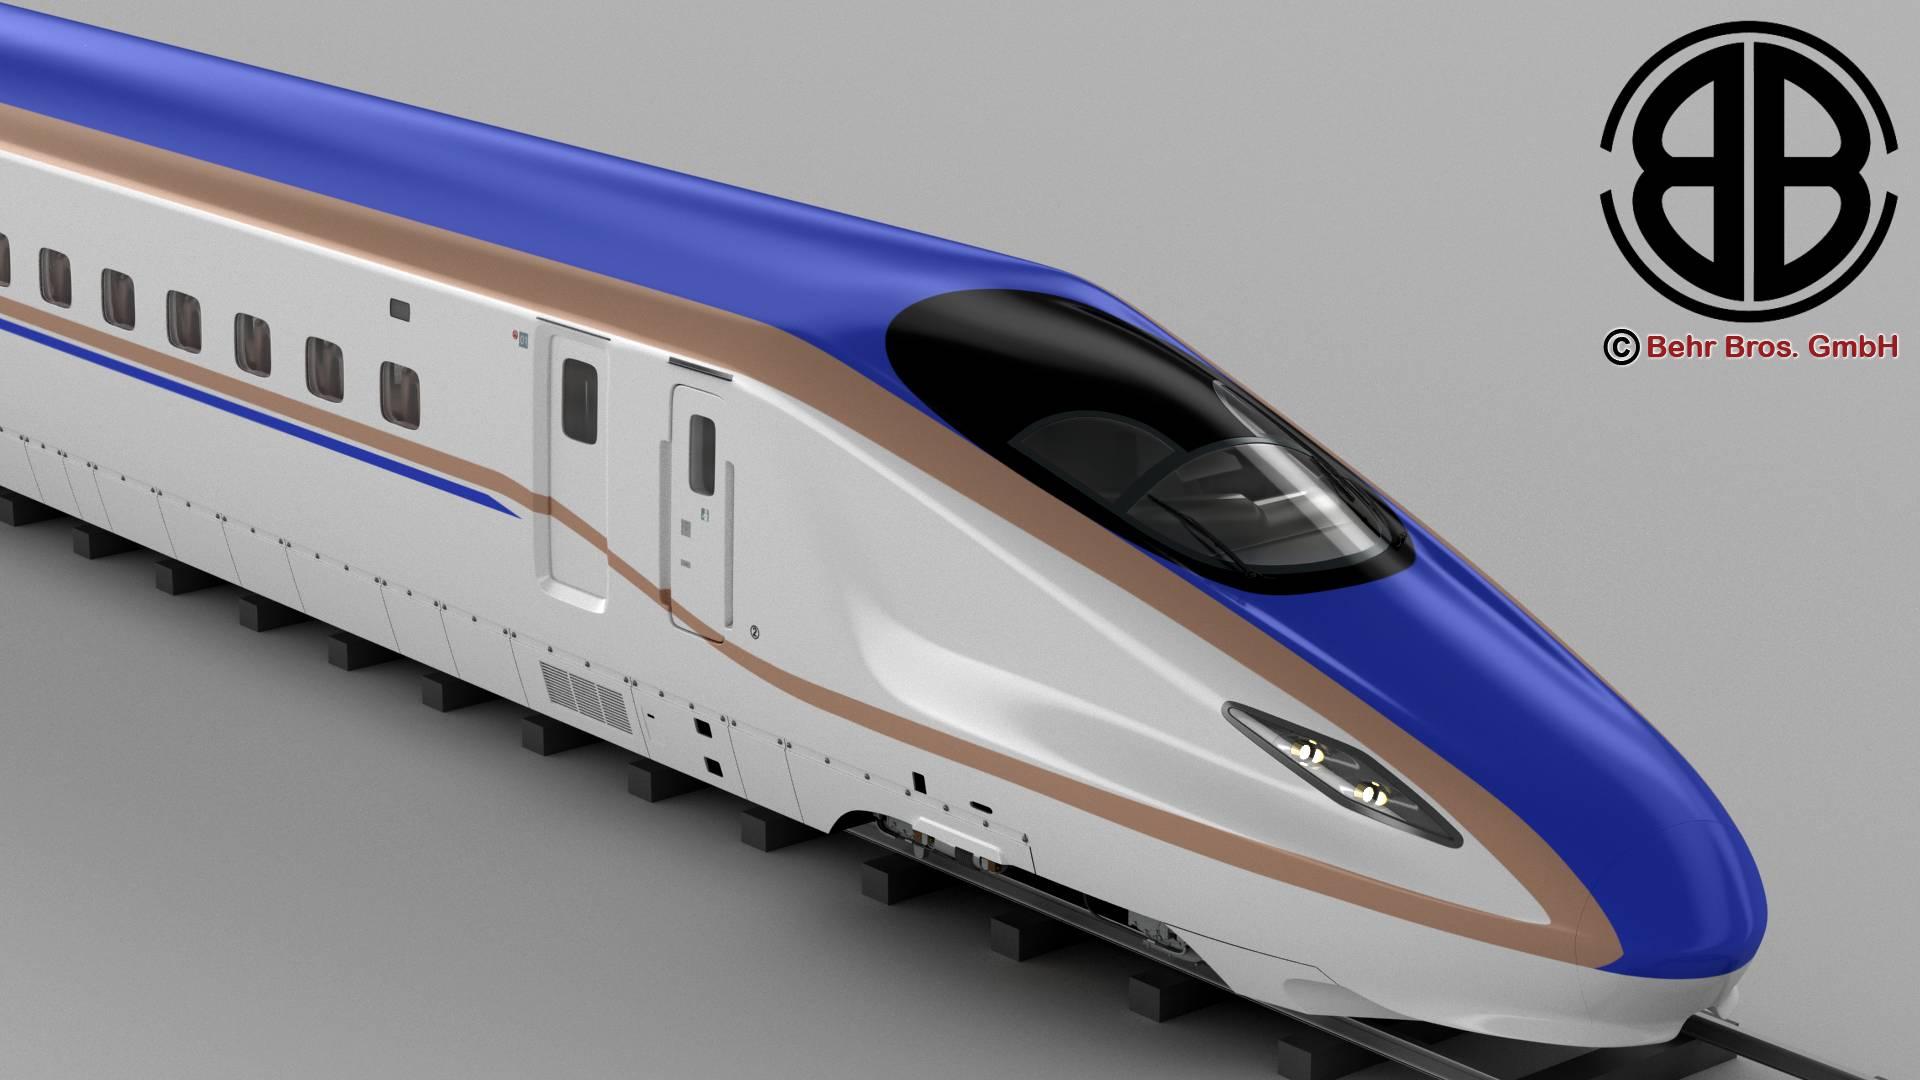 shinkansen e7 3d model 3ds max fbx c4d lwo ma mb obj 265649